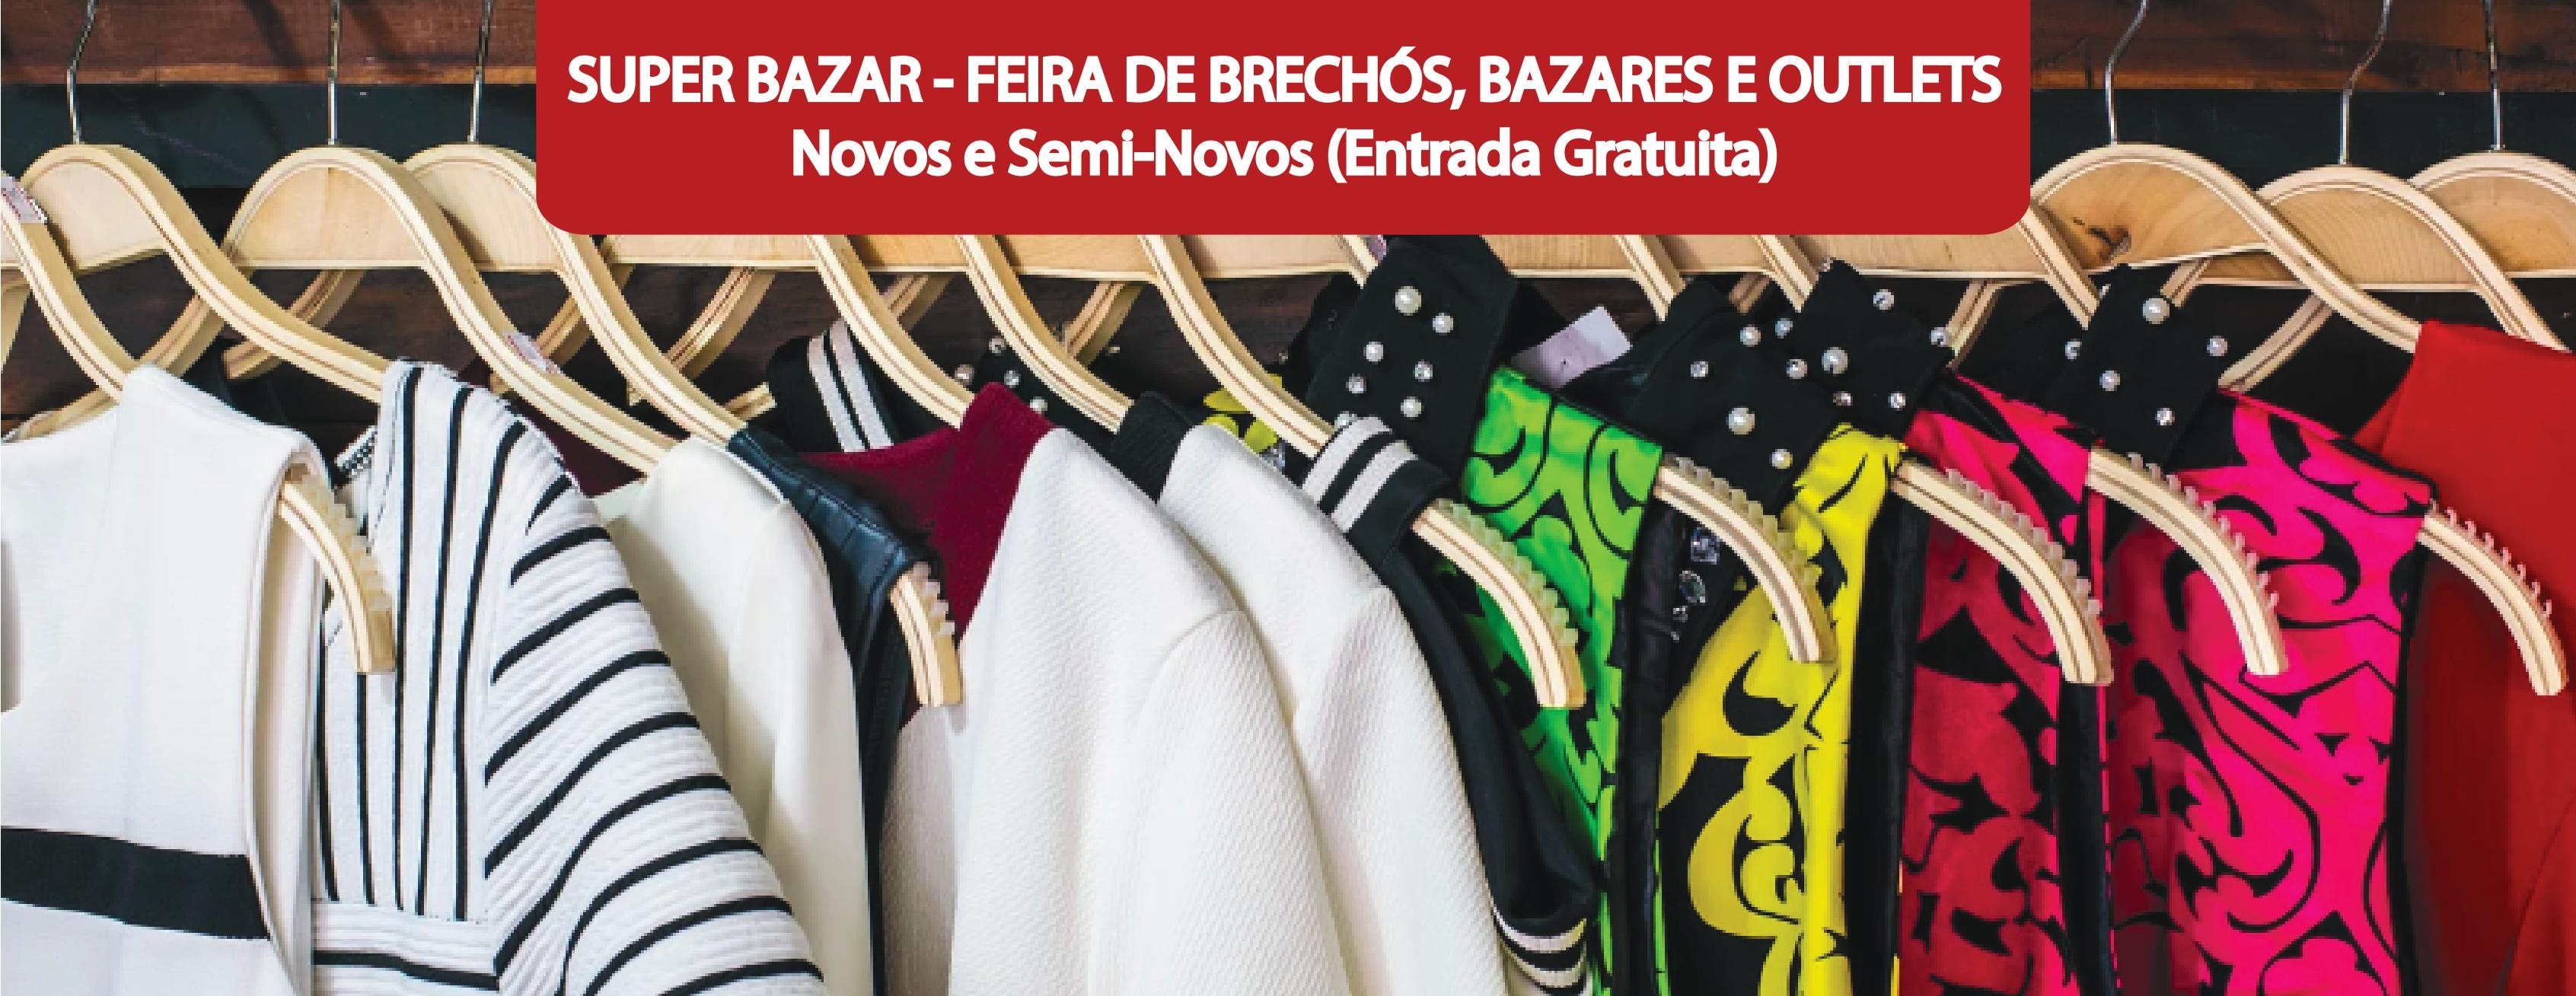 579c58a03e8 Feira de Brechós - PREÇO MÁXIMO R  39